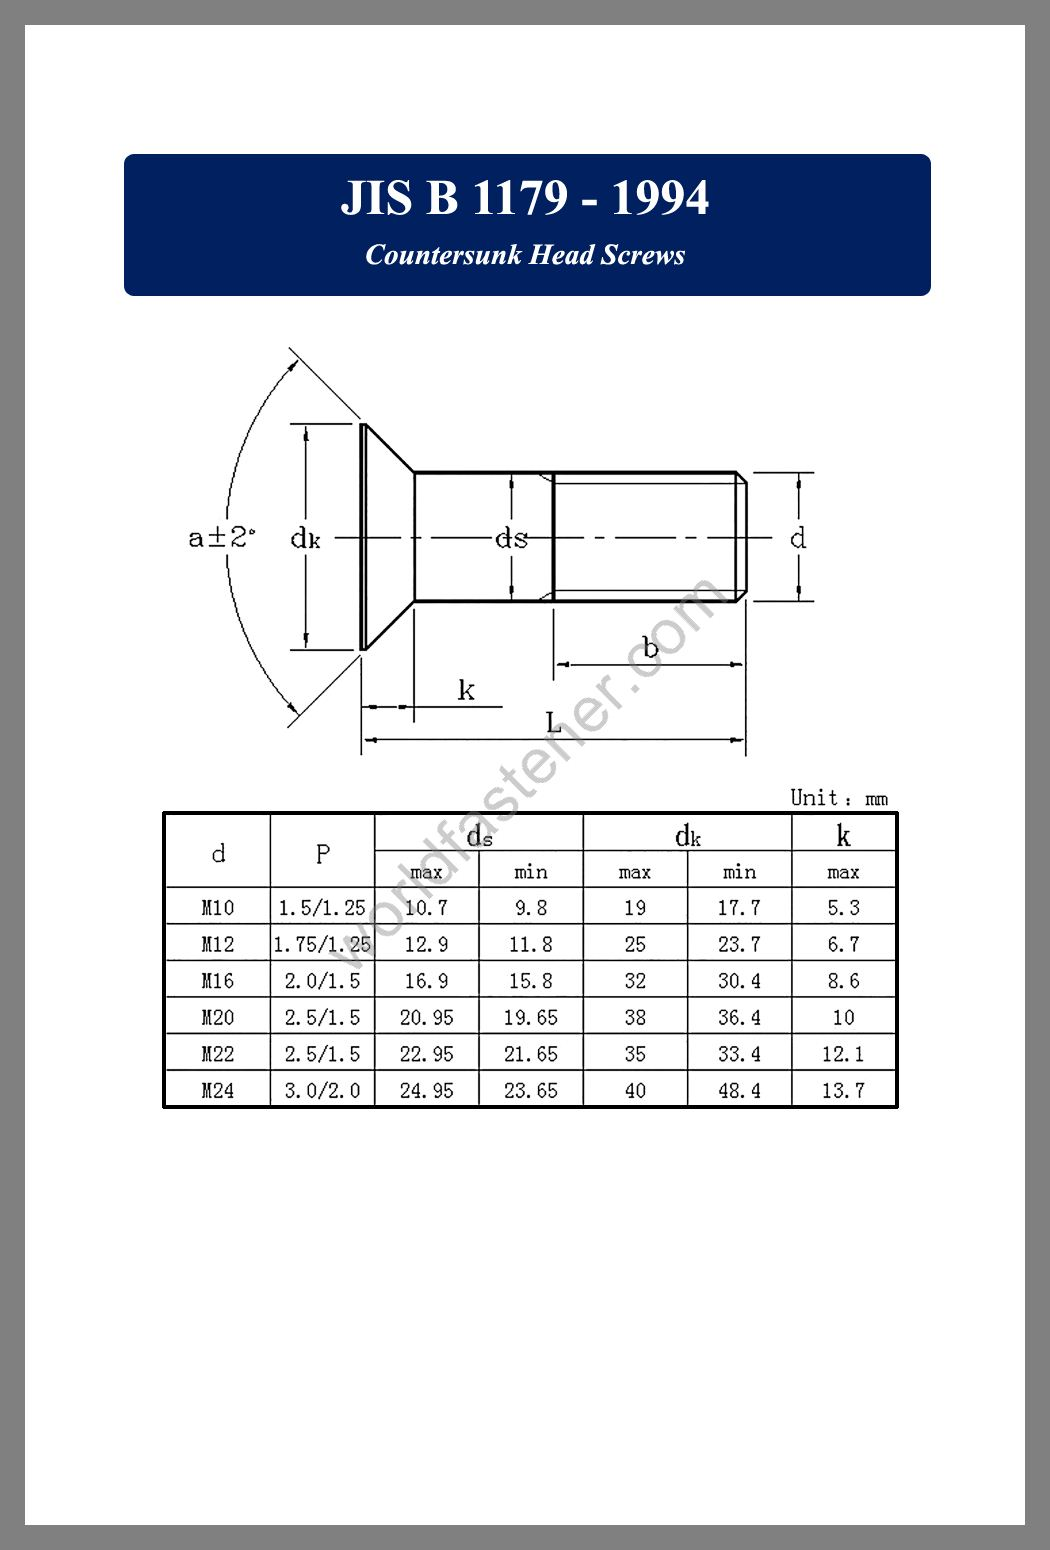 JIS B 1179 Countersunk Head Screws, JIS B1179, Countersunk Head Screws, fastener, screw, bolt, JIS bolts, JIS Fasteners